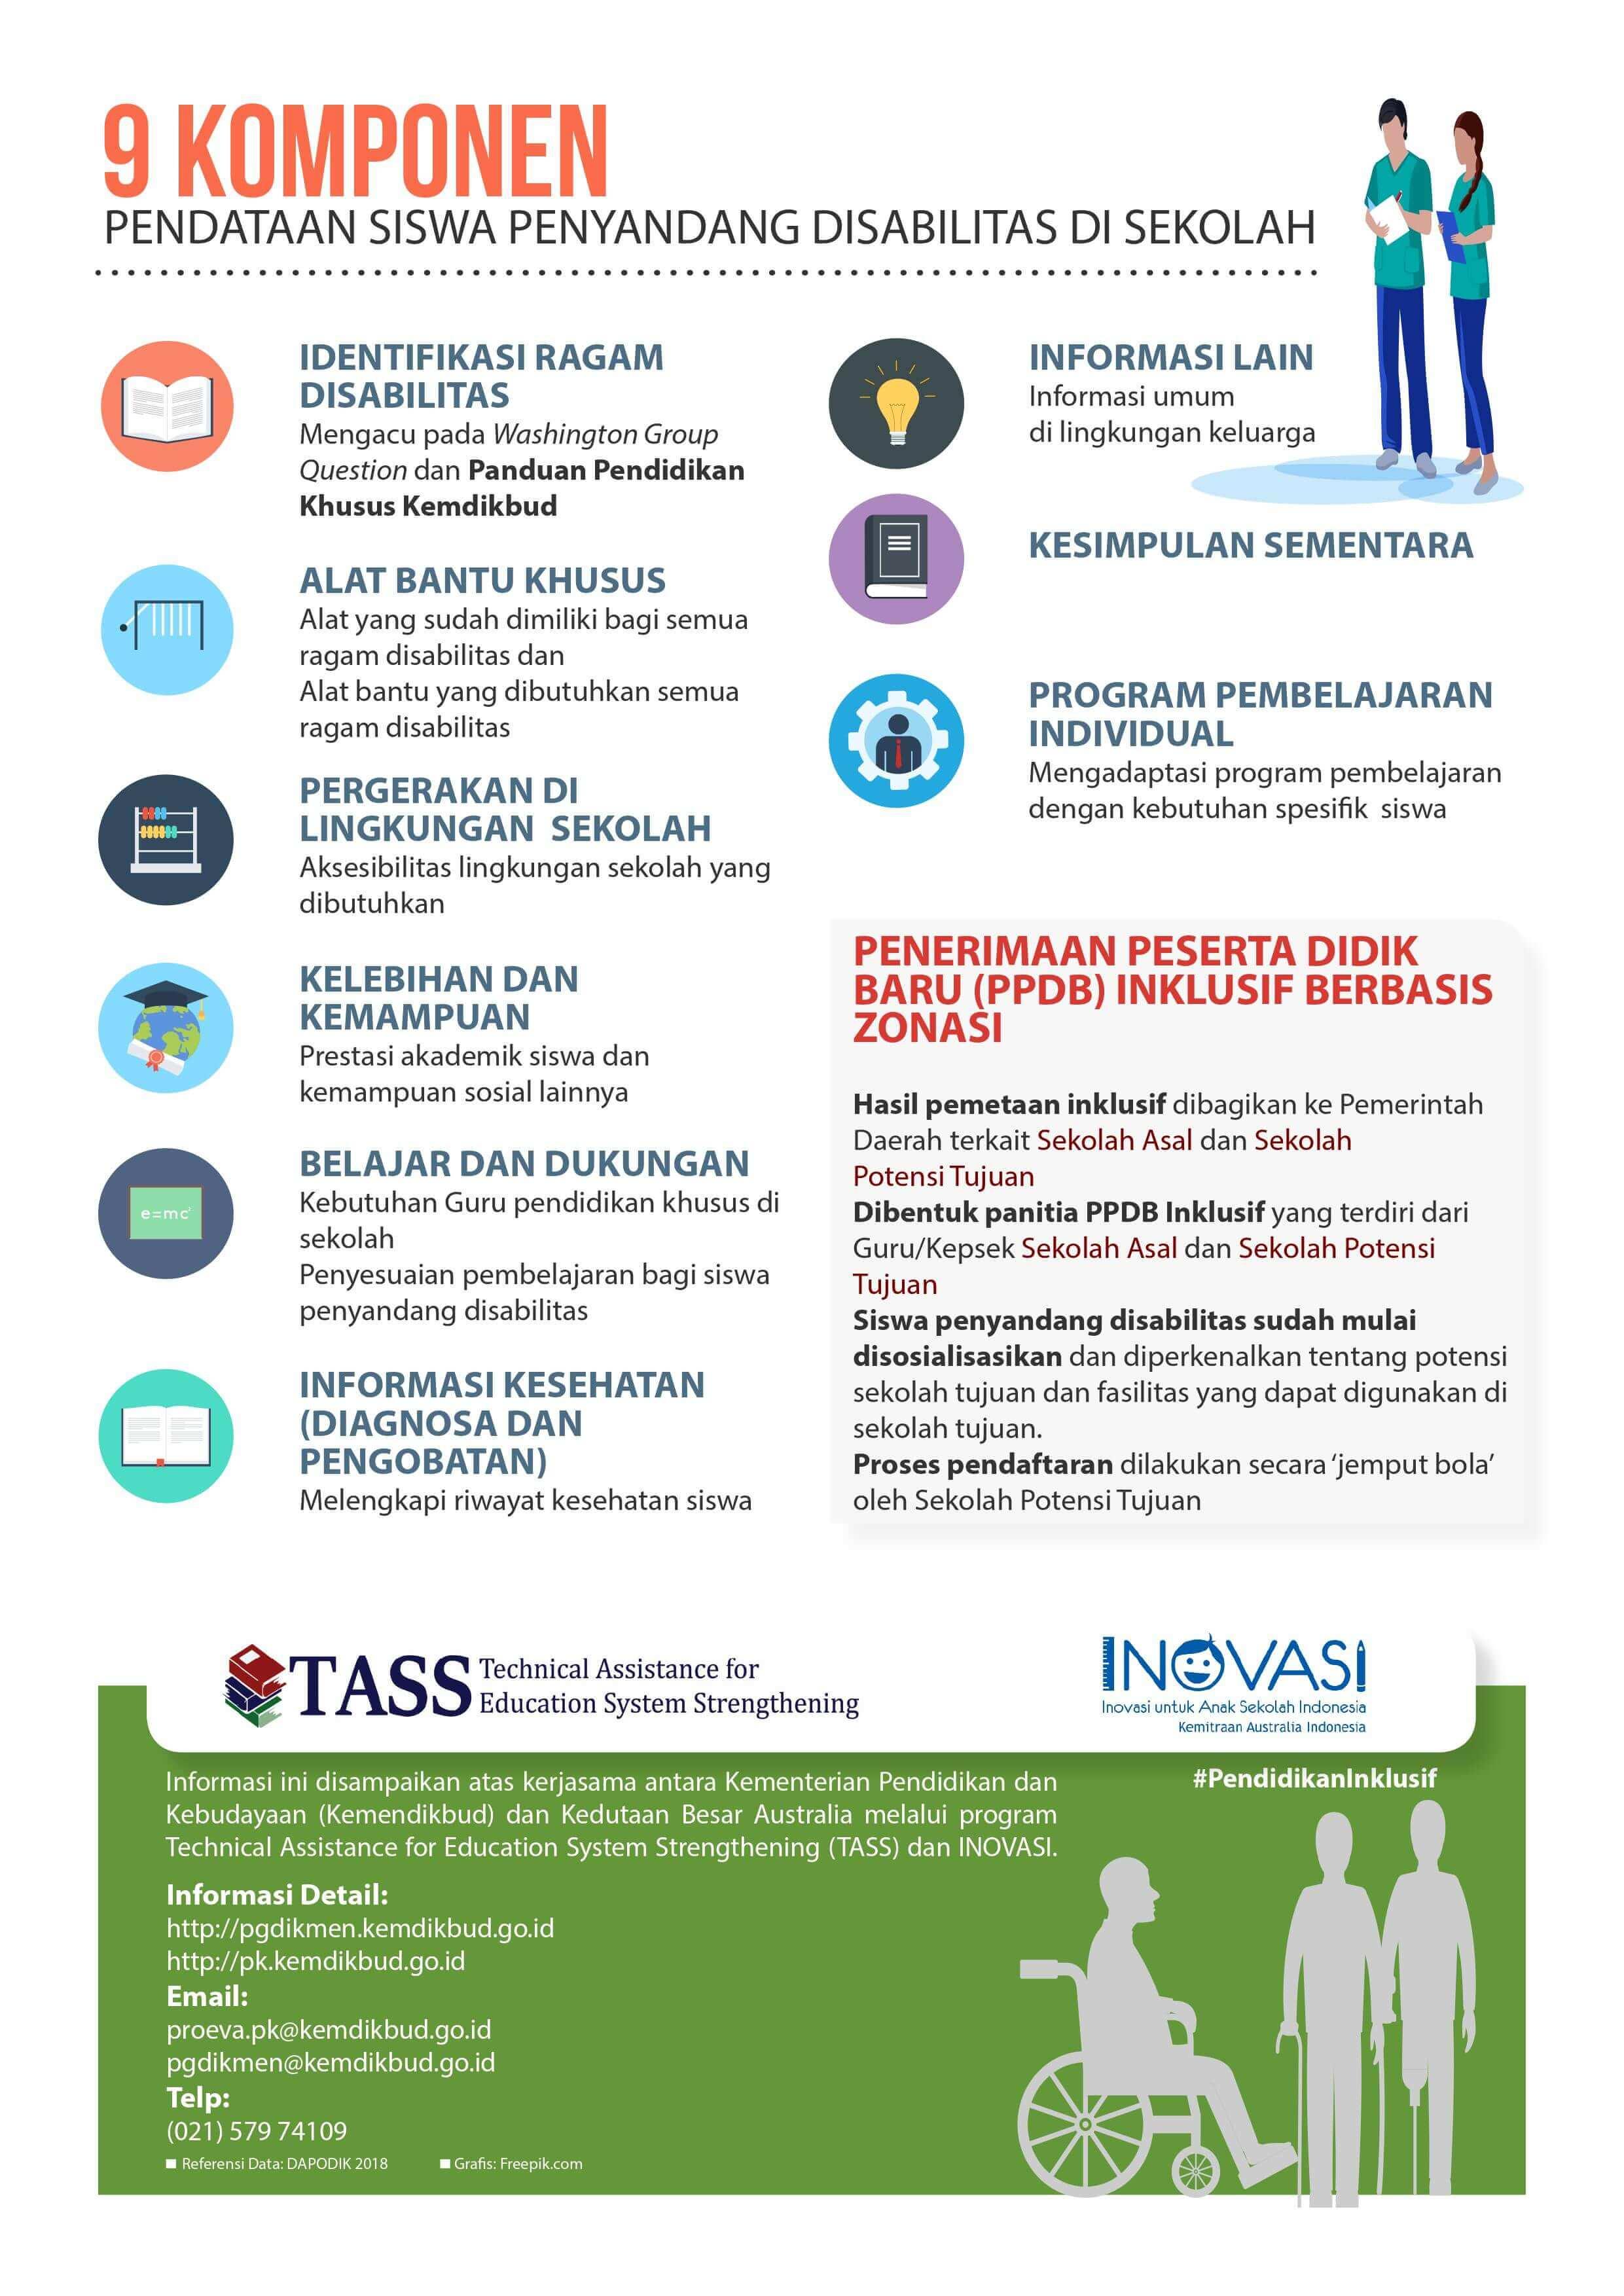 Infografis Panduan Pendataan Siswa Penyandang Disabilitas